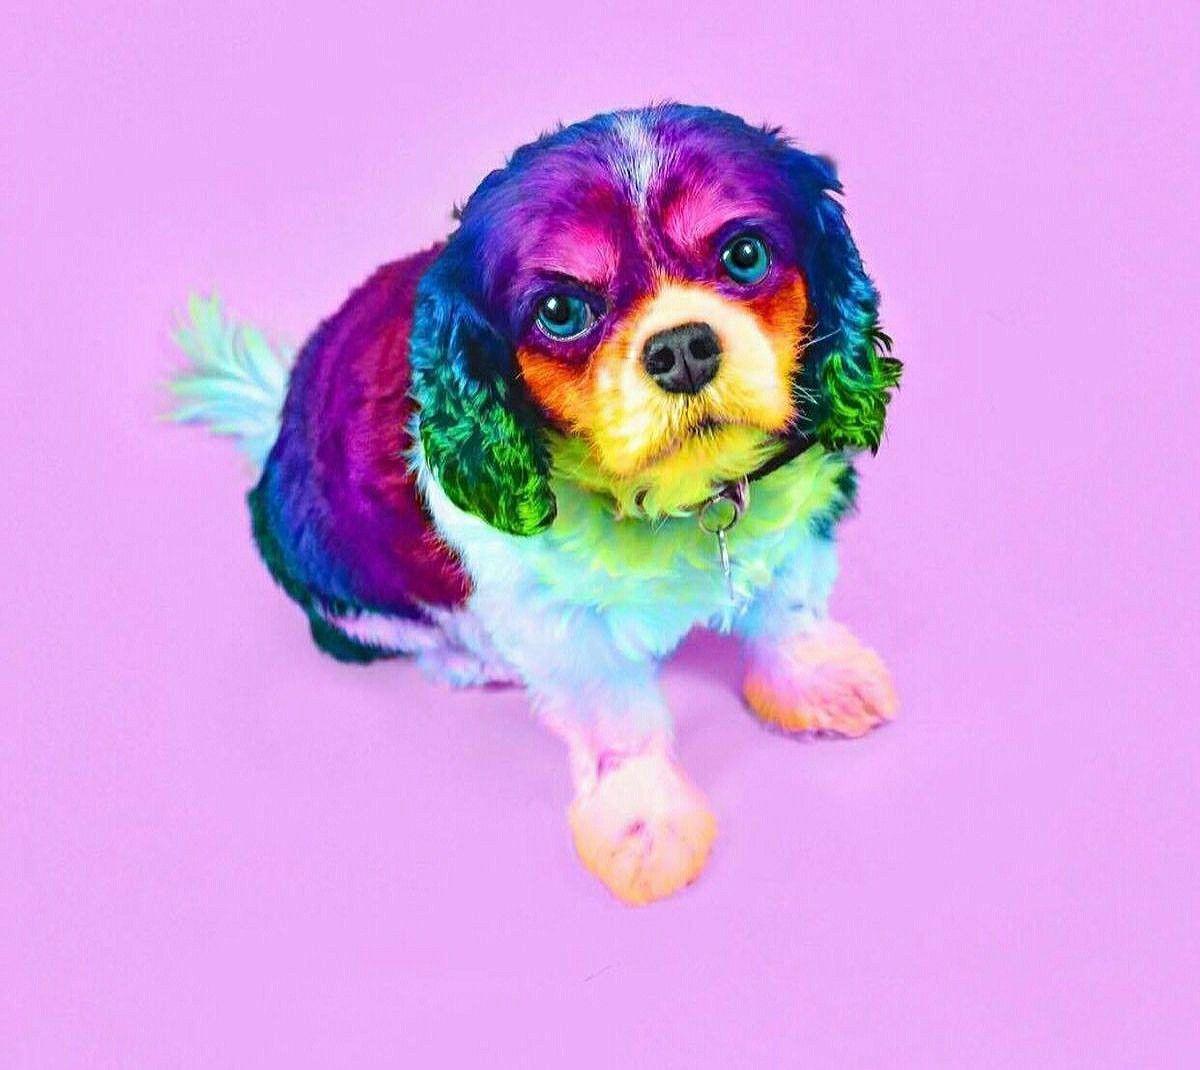 Pin By Aubrey Chanthalack On Little Doggies Cute Baby Animals